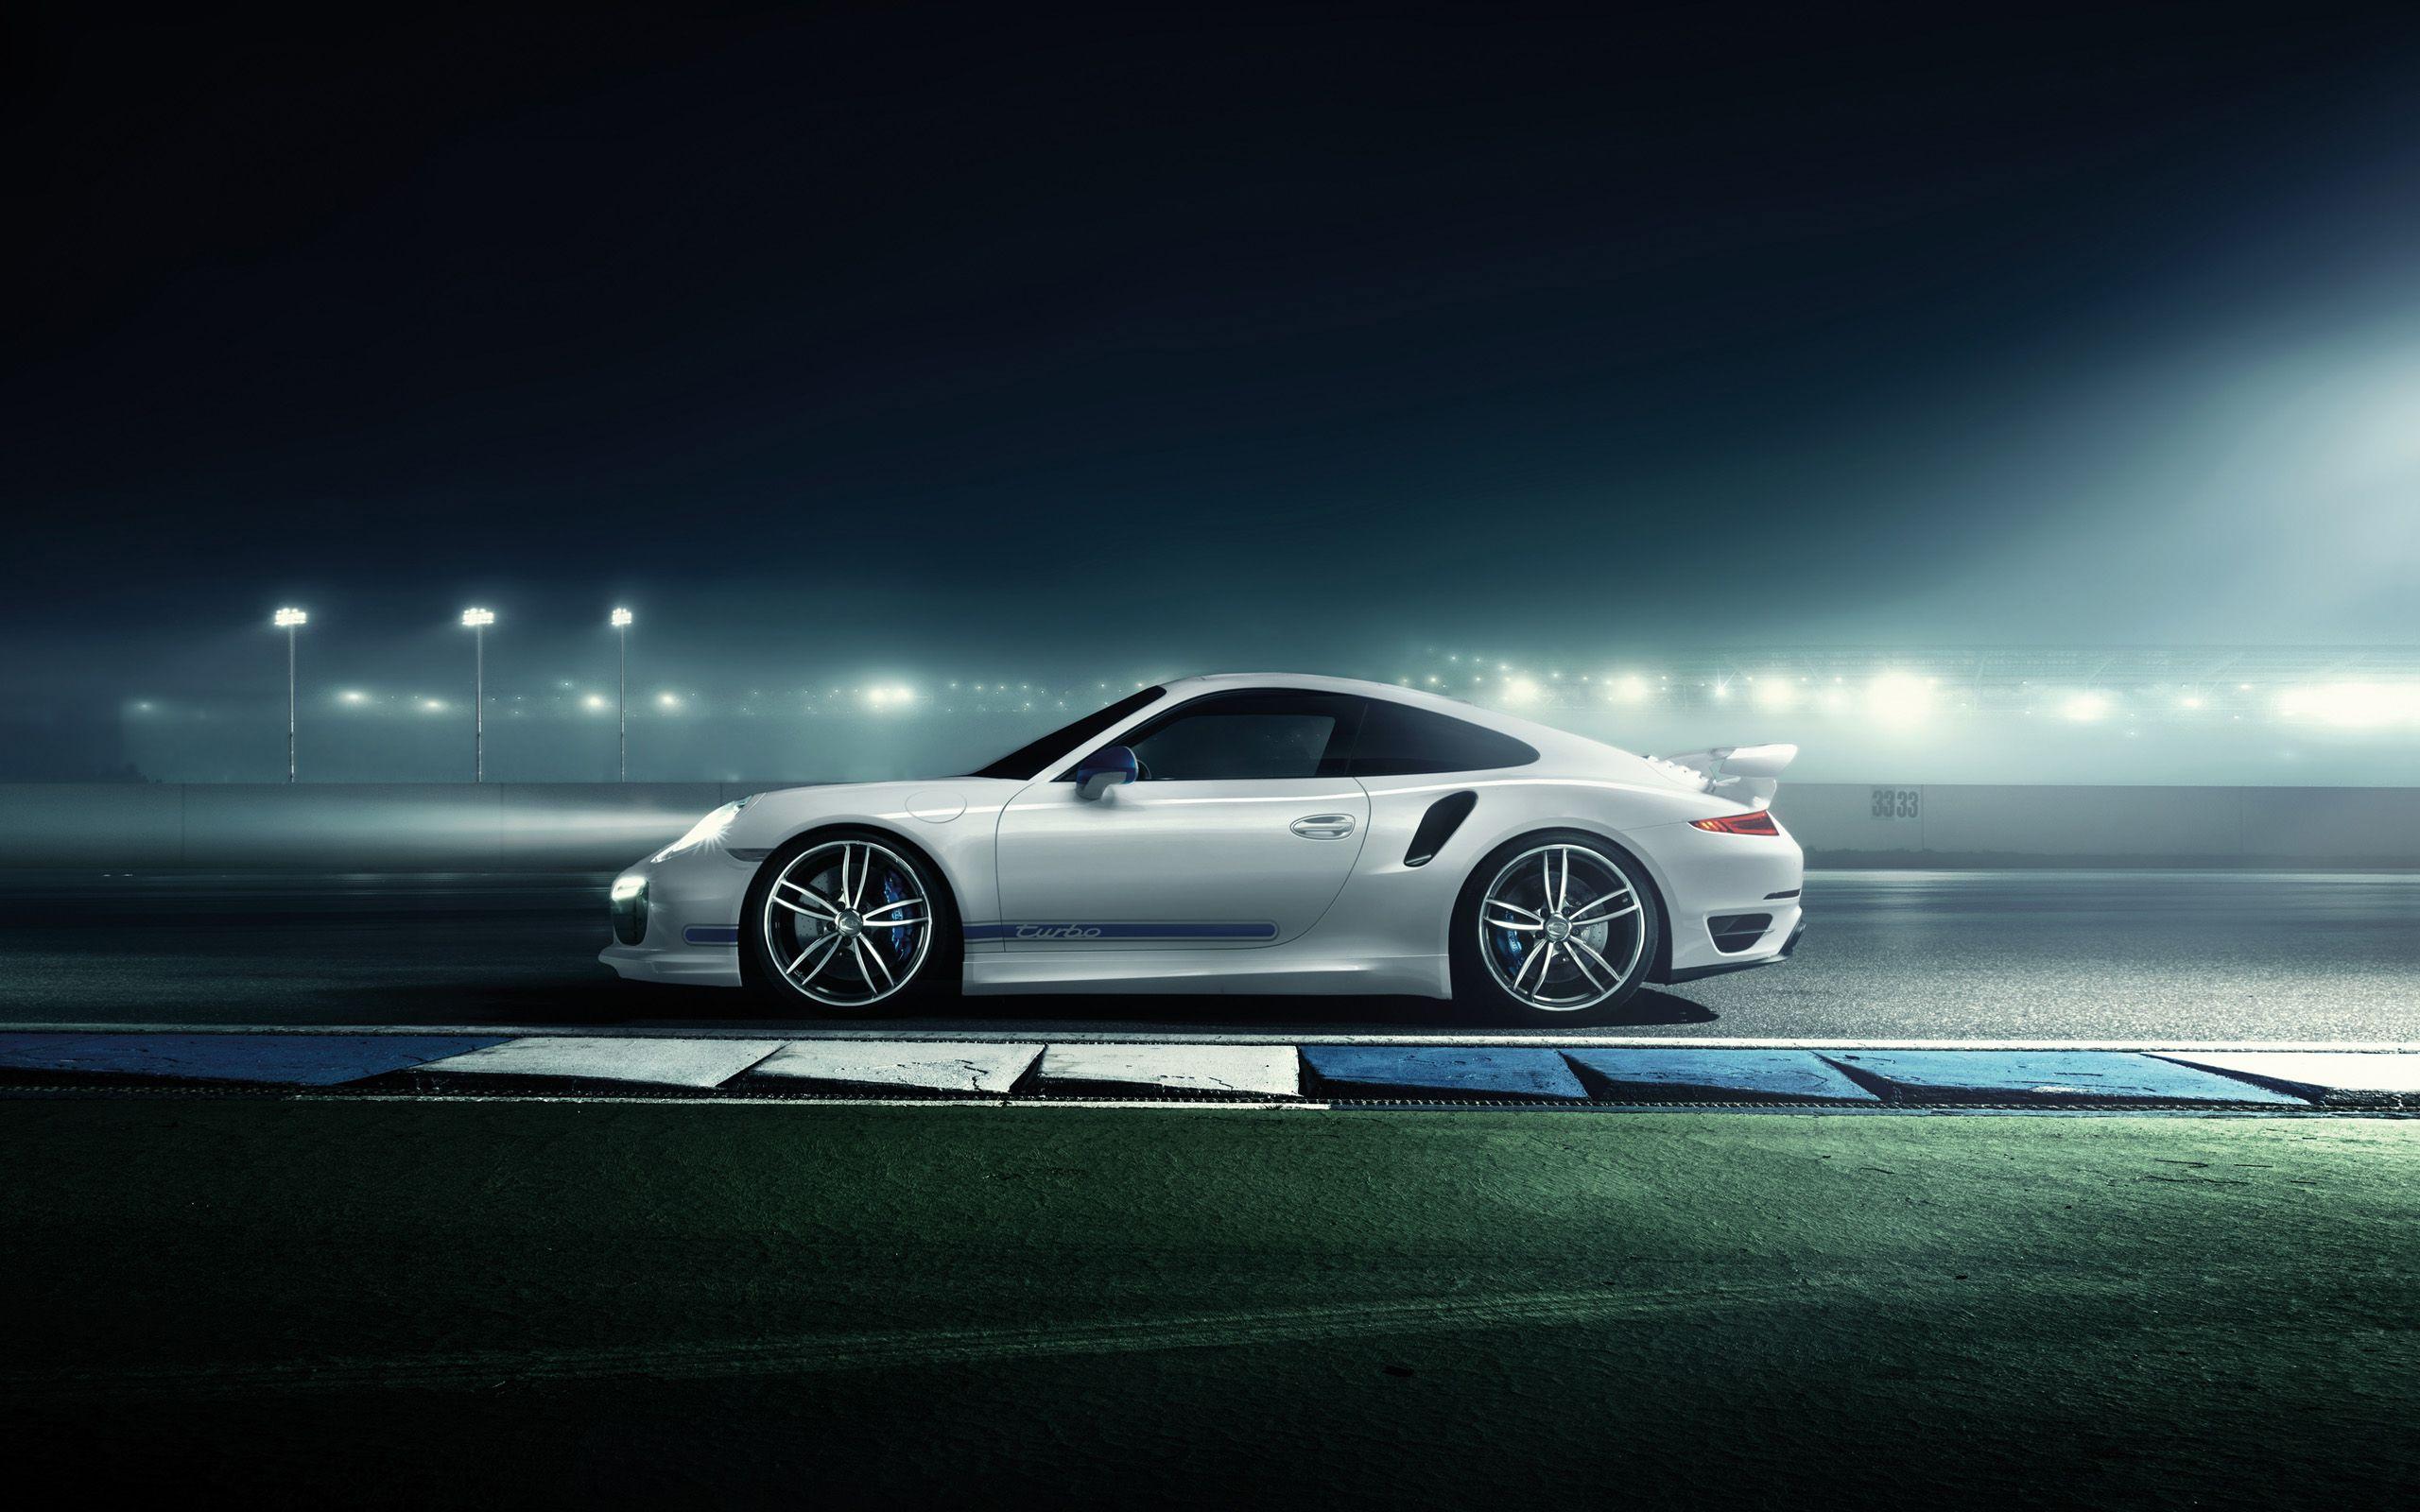 Car Wallpaper High Definition Wiw Porsche 911 Turbo Porsche 911 911 Turbo S